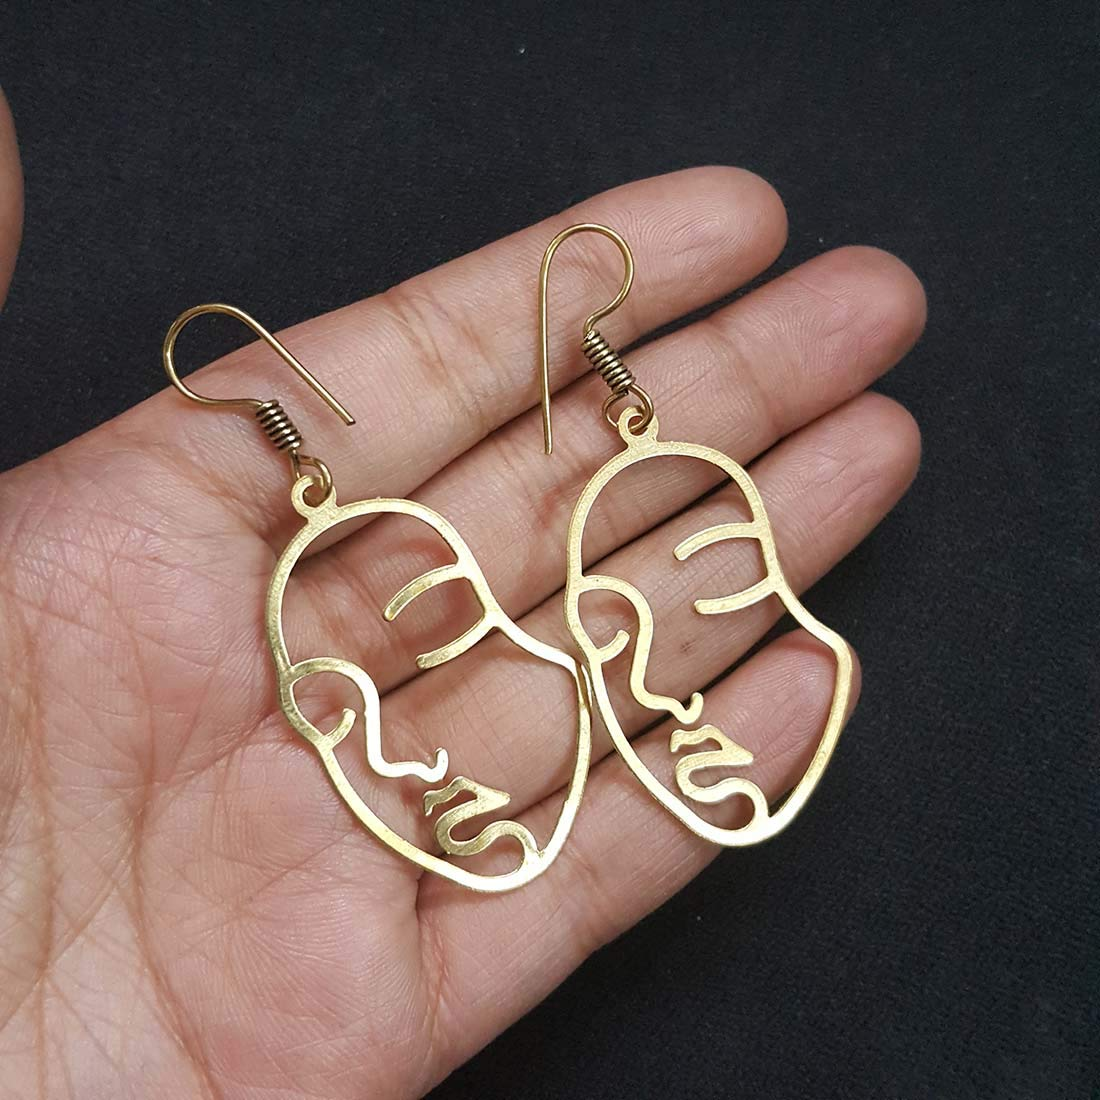 Face Earring Set of 2 Pairs Gold Tone Hypoallergenic Earrings for Girls Teens Women Earrings Including Hollow Face Hand Shape Gold Statement Earrings jaipri